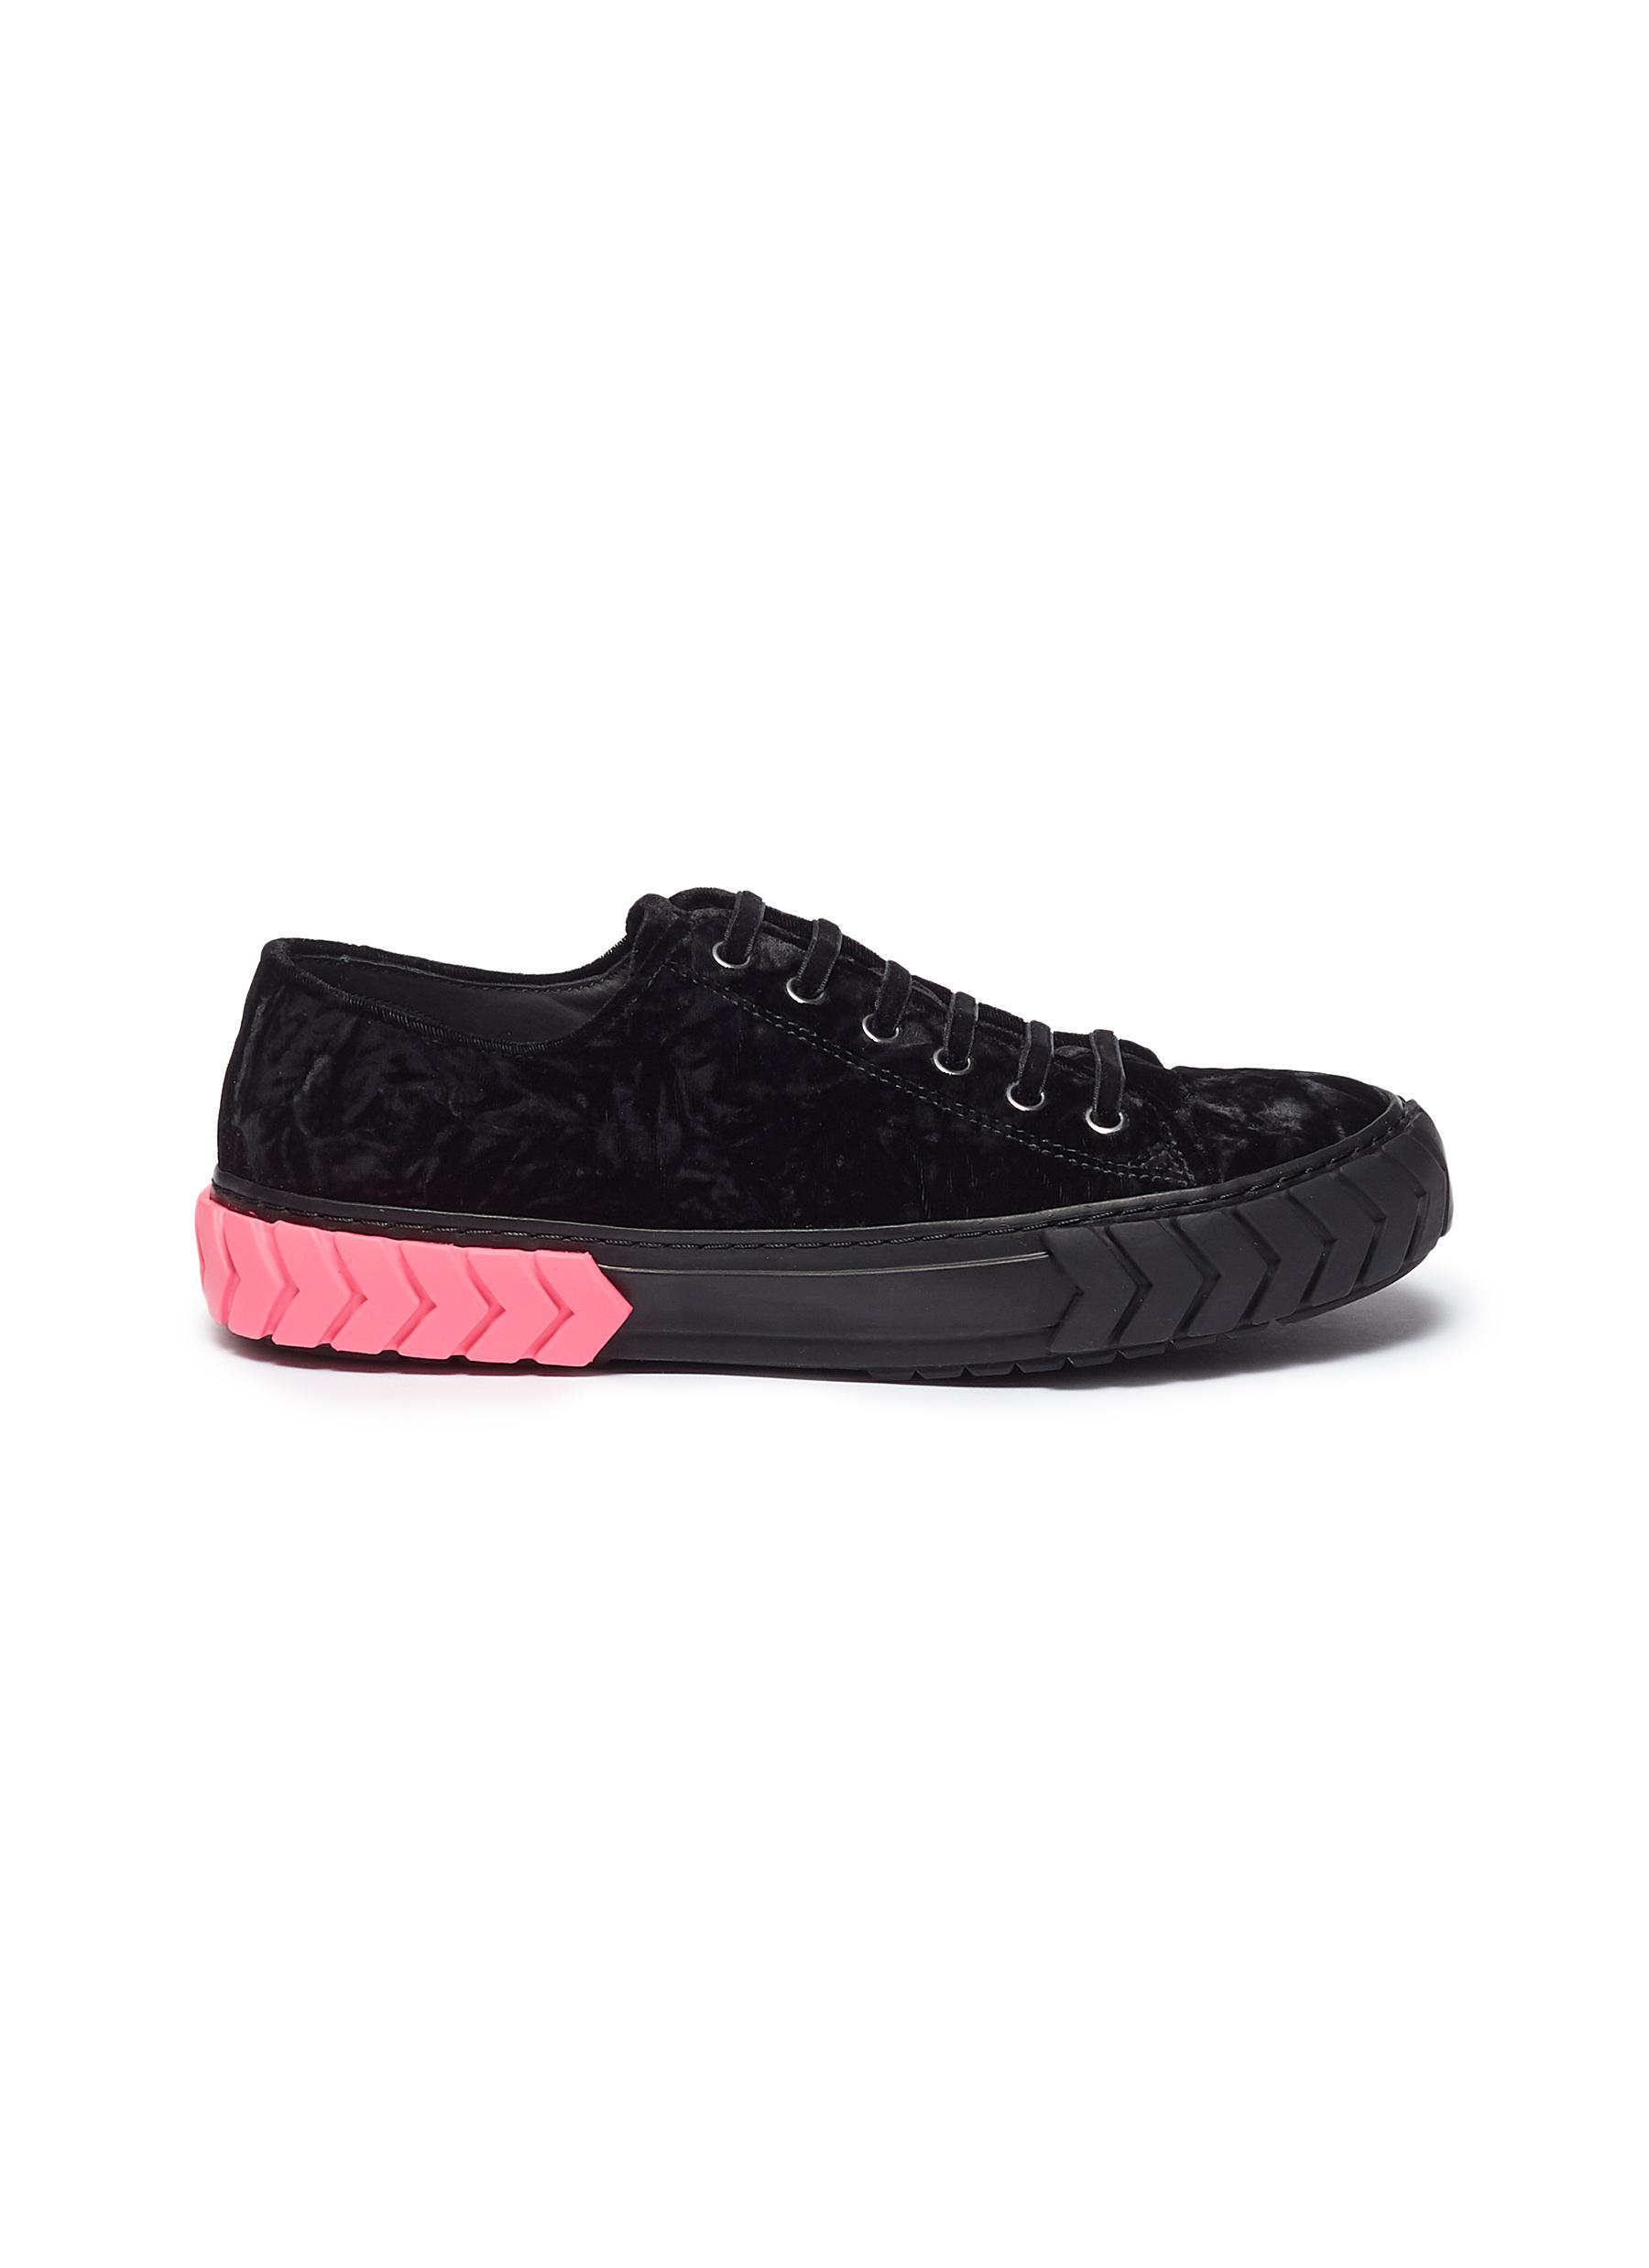 Colourblock tyre midsole velvet sneakers by both